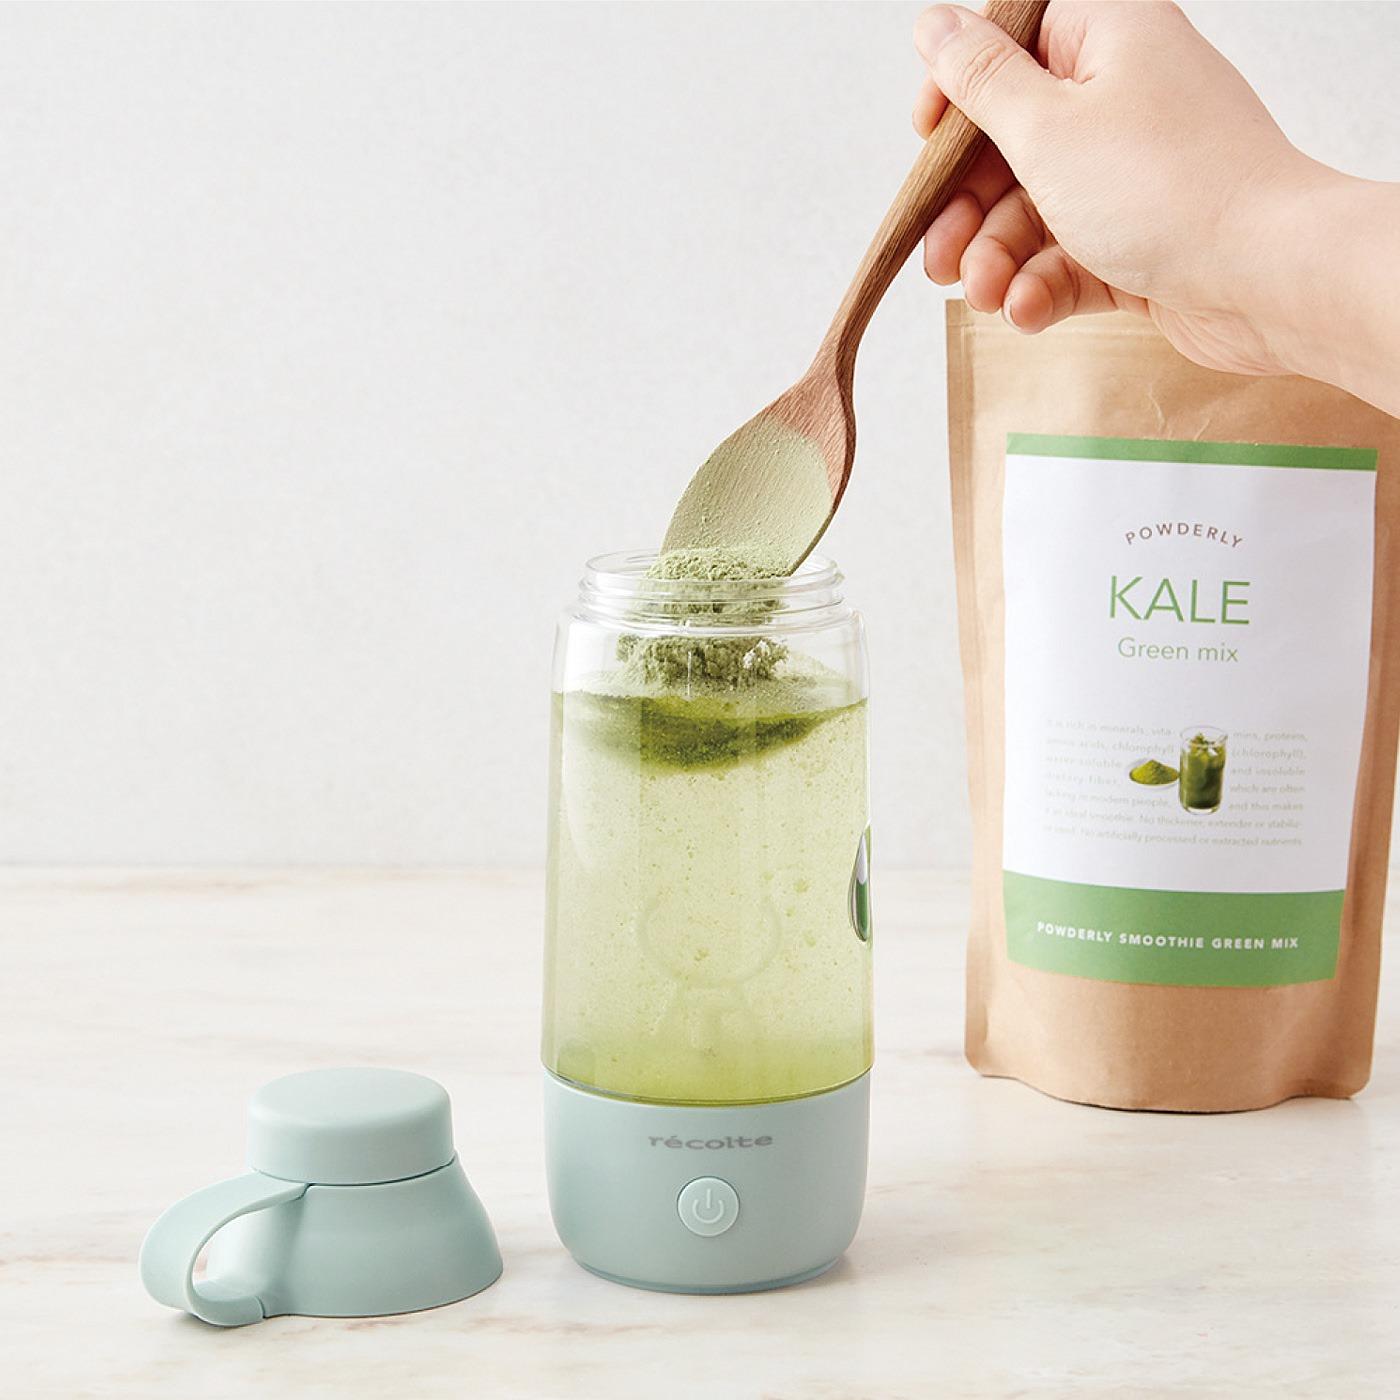 Kraso[クラソ] |溶けにくい粉末ドリンクをボタンひとつで滑らかに そのまま飲める電動シェイクボトル〈ペールブルー〉|作り方1.ボトルに水や牛乳などと一緒に粉末を入れます。